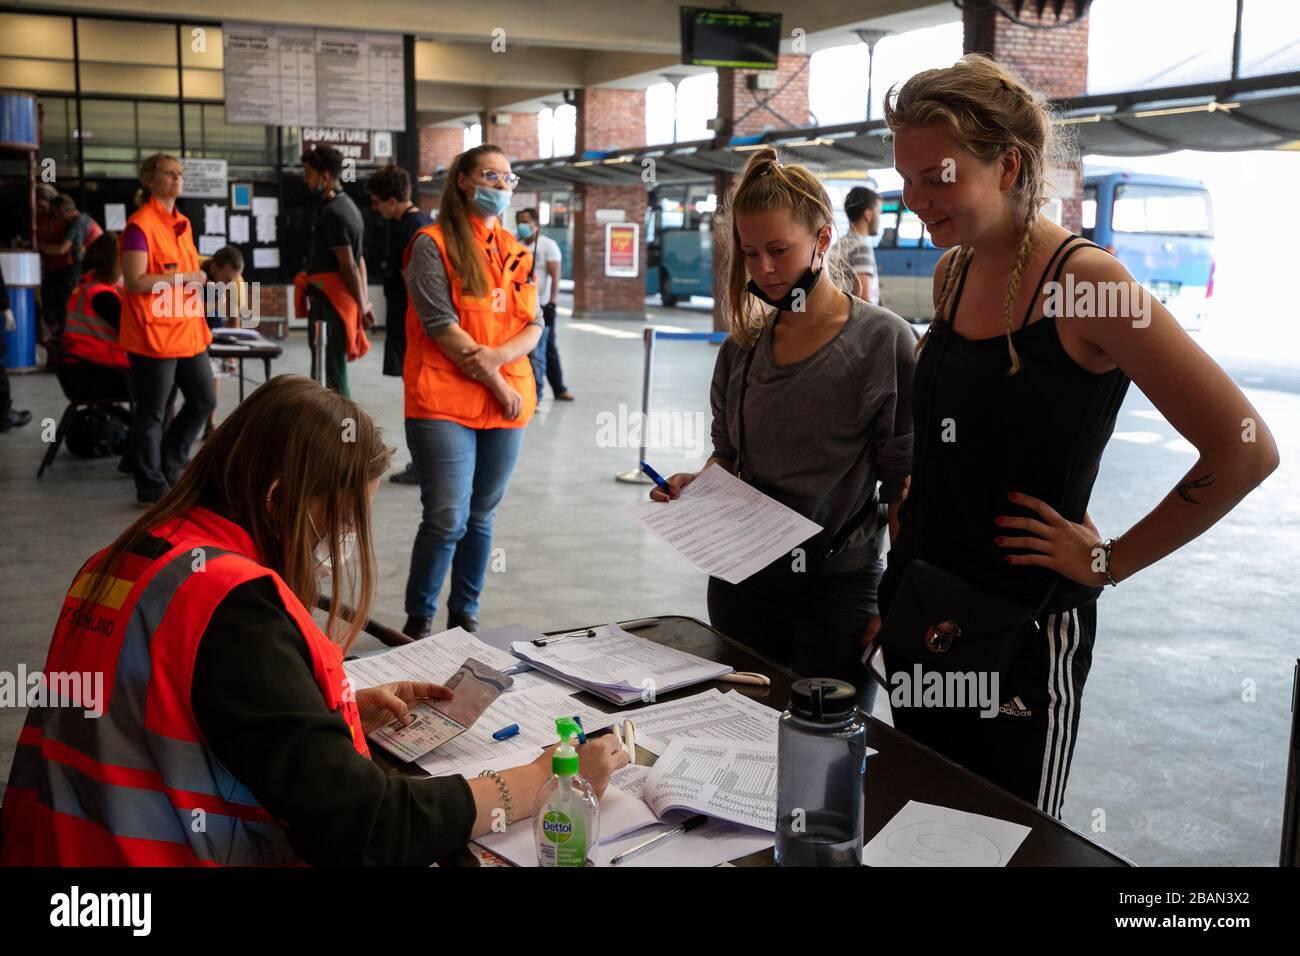 Kathmandu Nepal 27th Mar 2020 A Staff From German Embassy Checks Passenger S Passports For Their Chartered